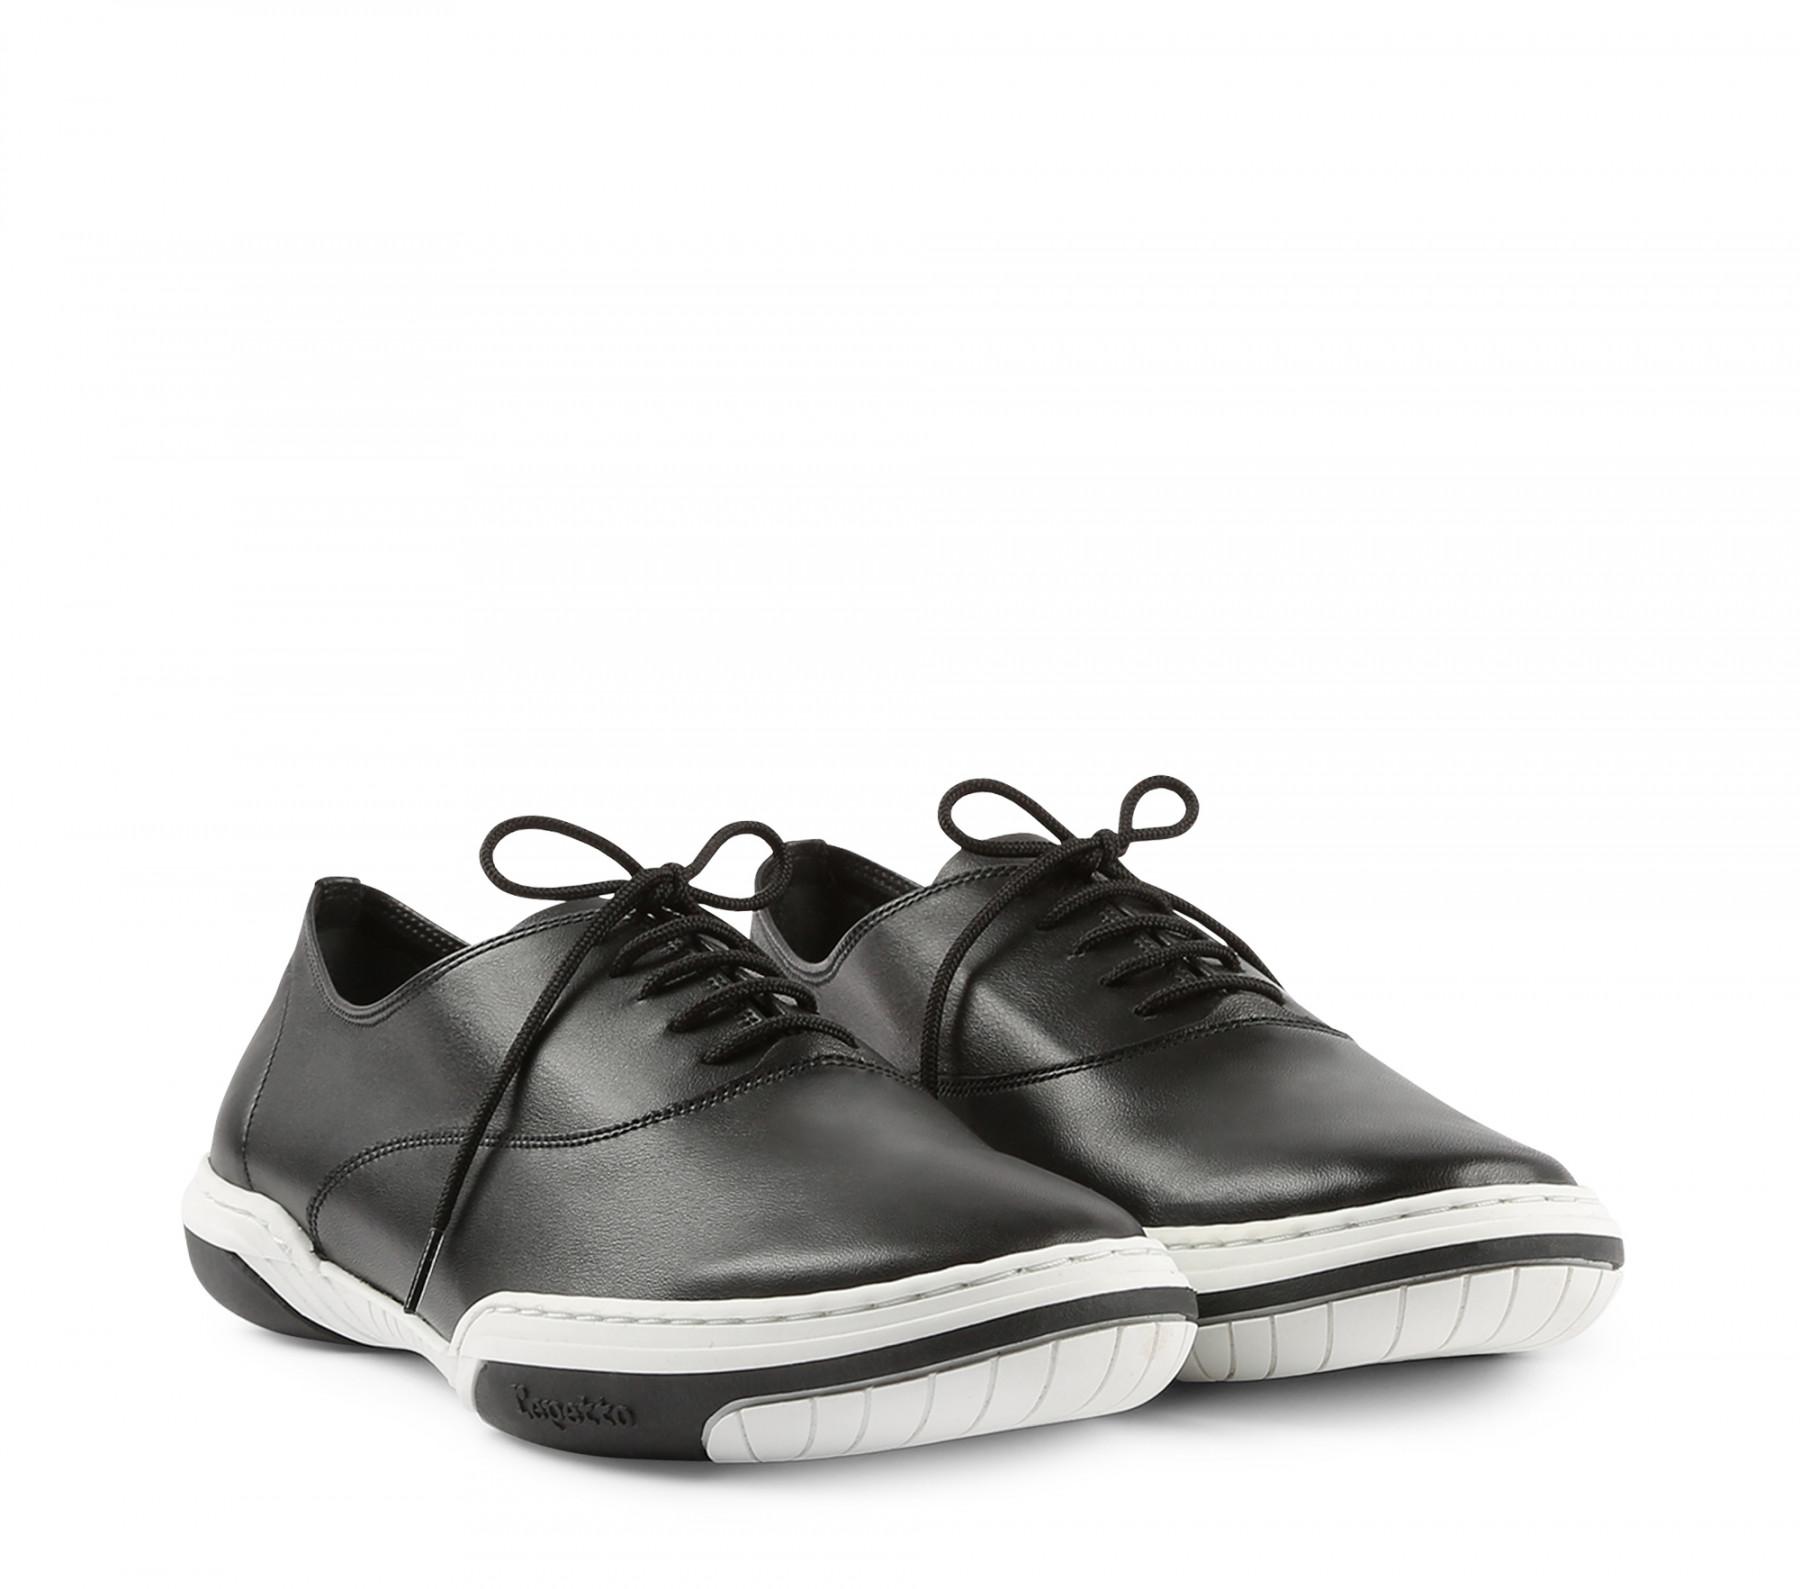 Austin sneakers